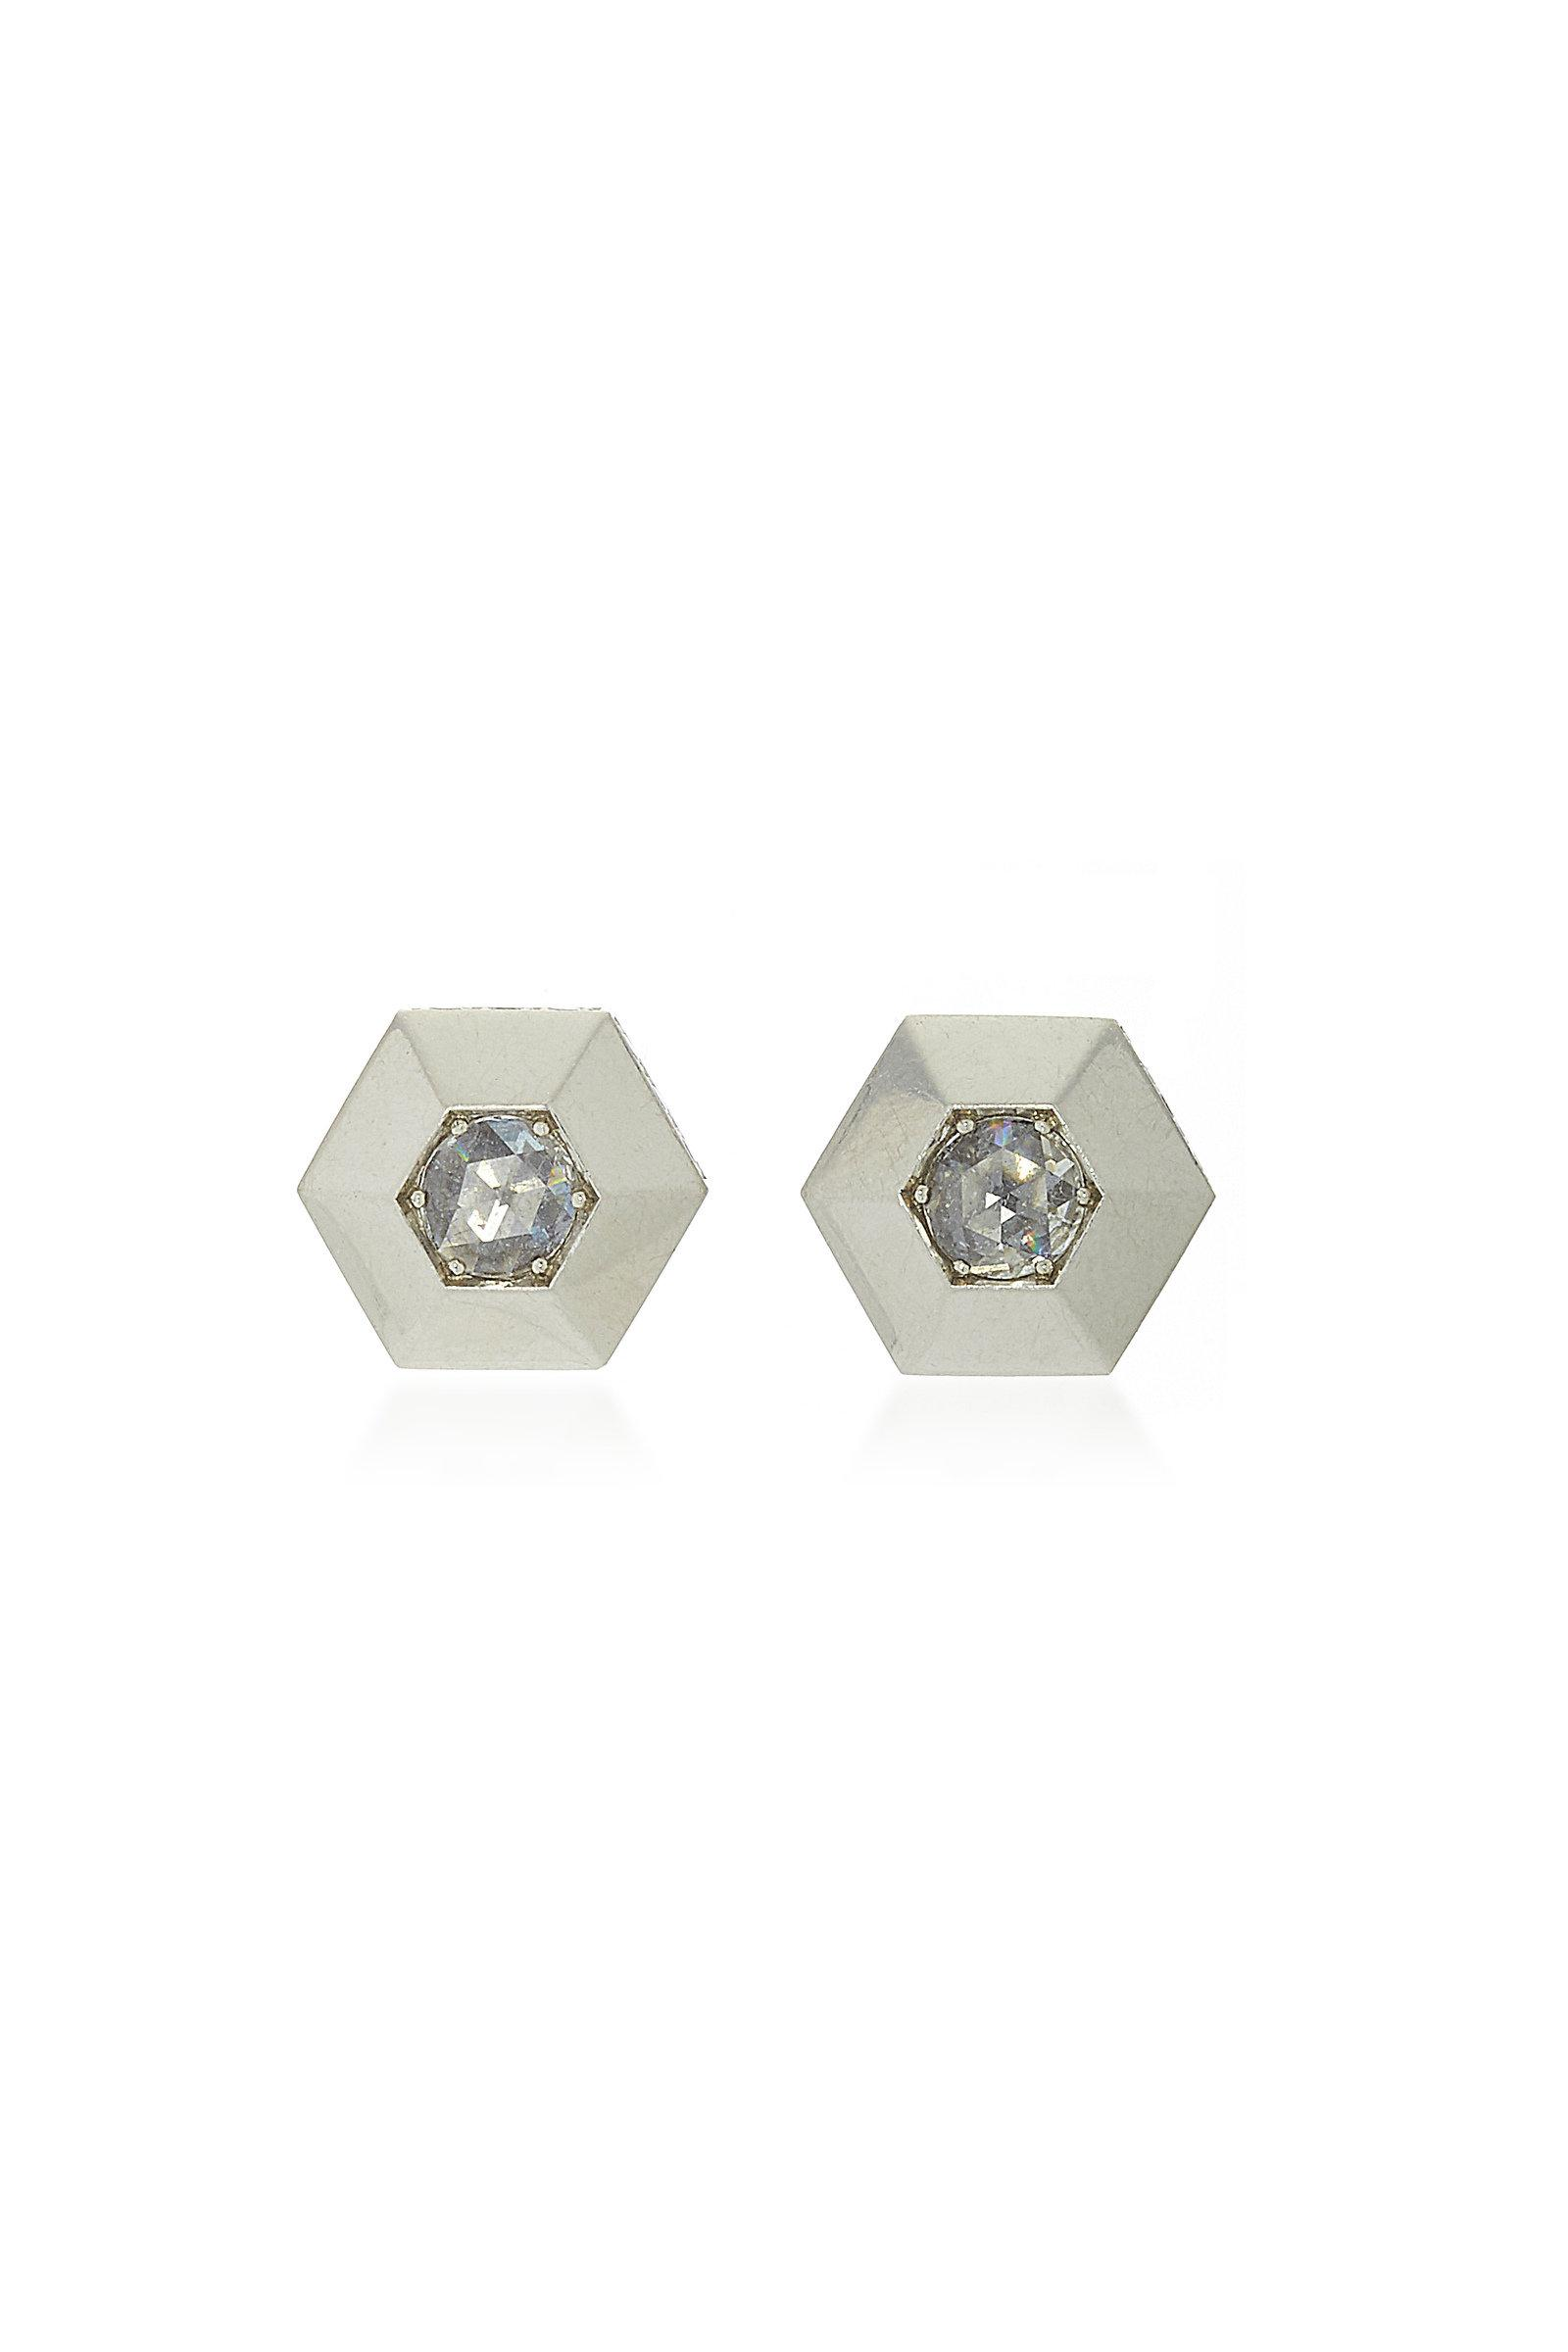 f08d15bca Fred Leighton Platinum Rose-cut Diamond Hexagonal Stud Earrings in ...